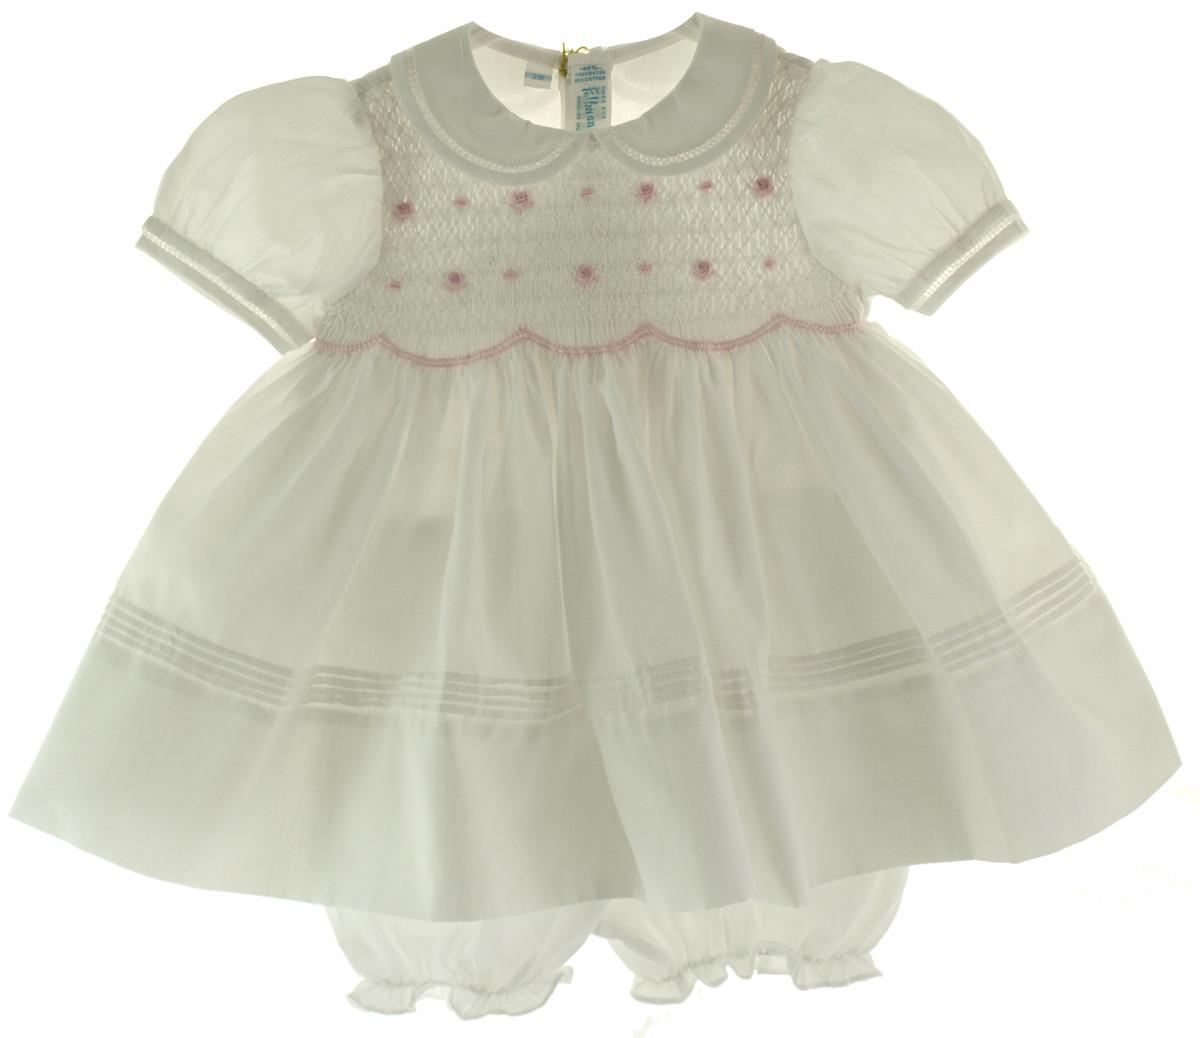 Feltman Brothers White Amp Pink Smocked Infant Girls Dress